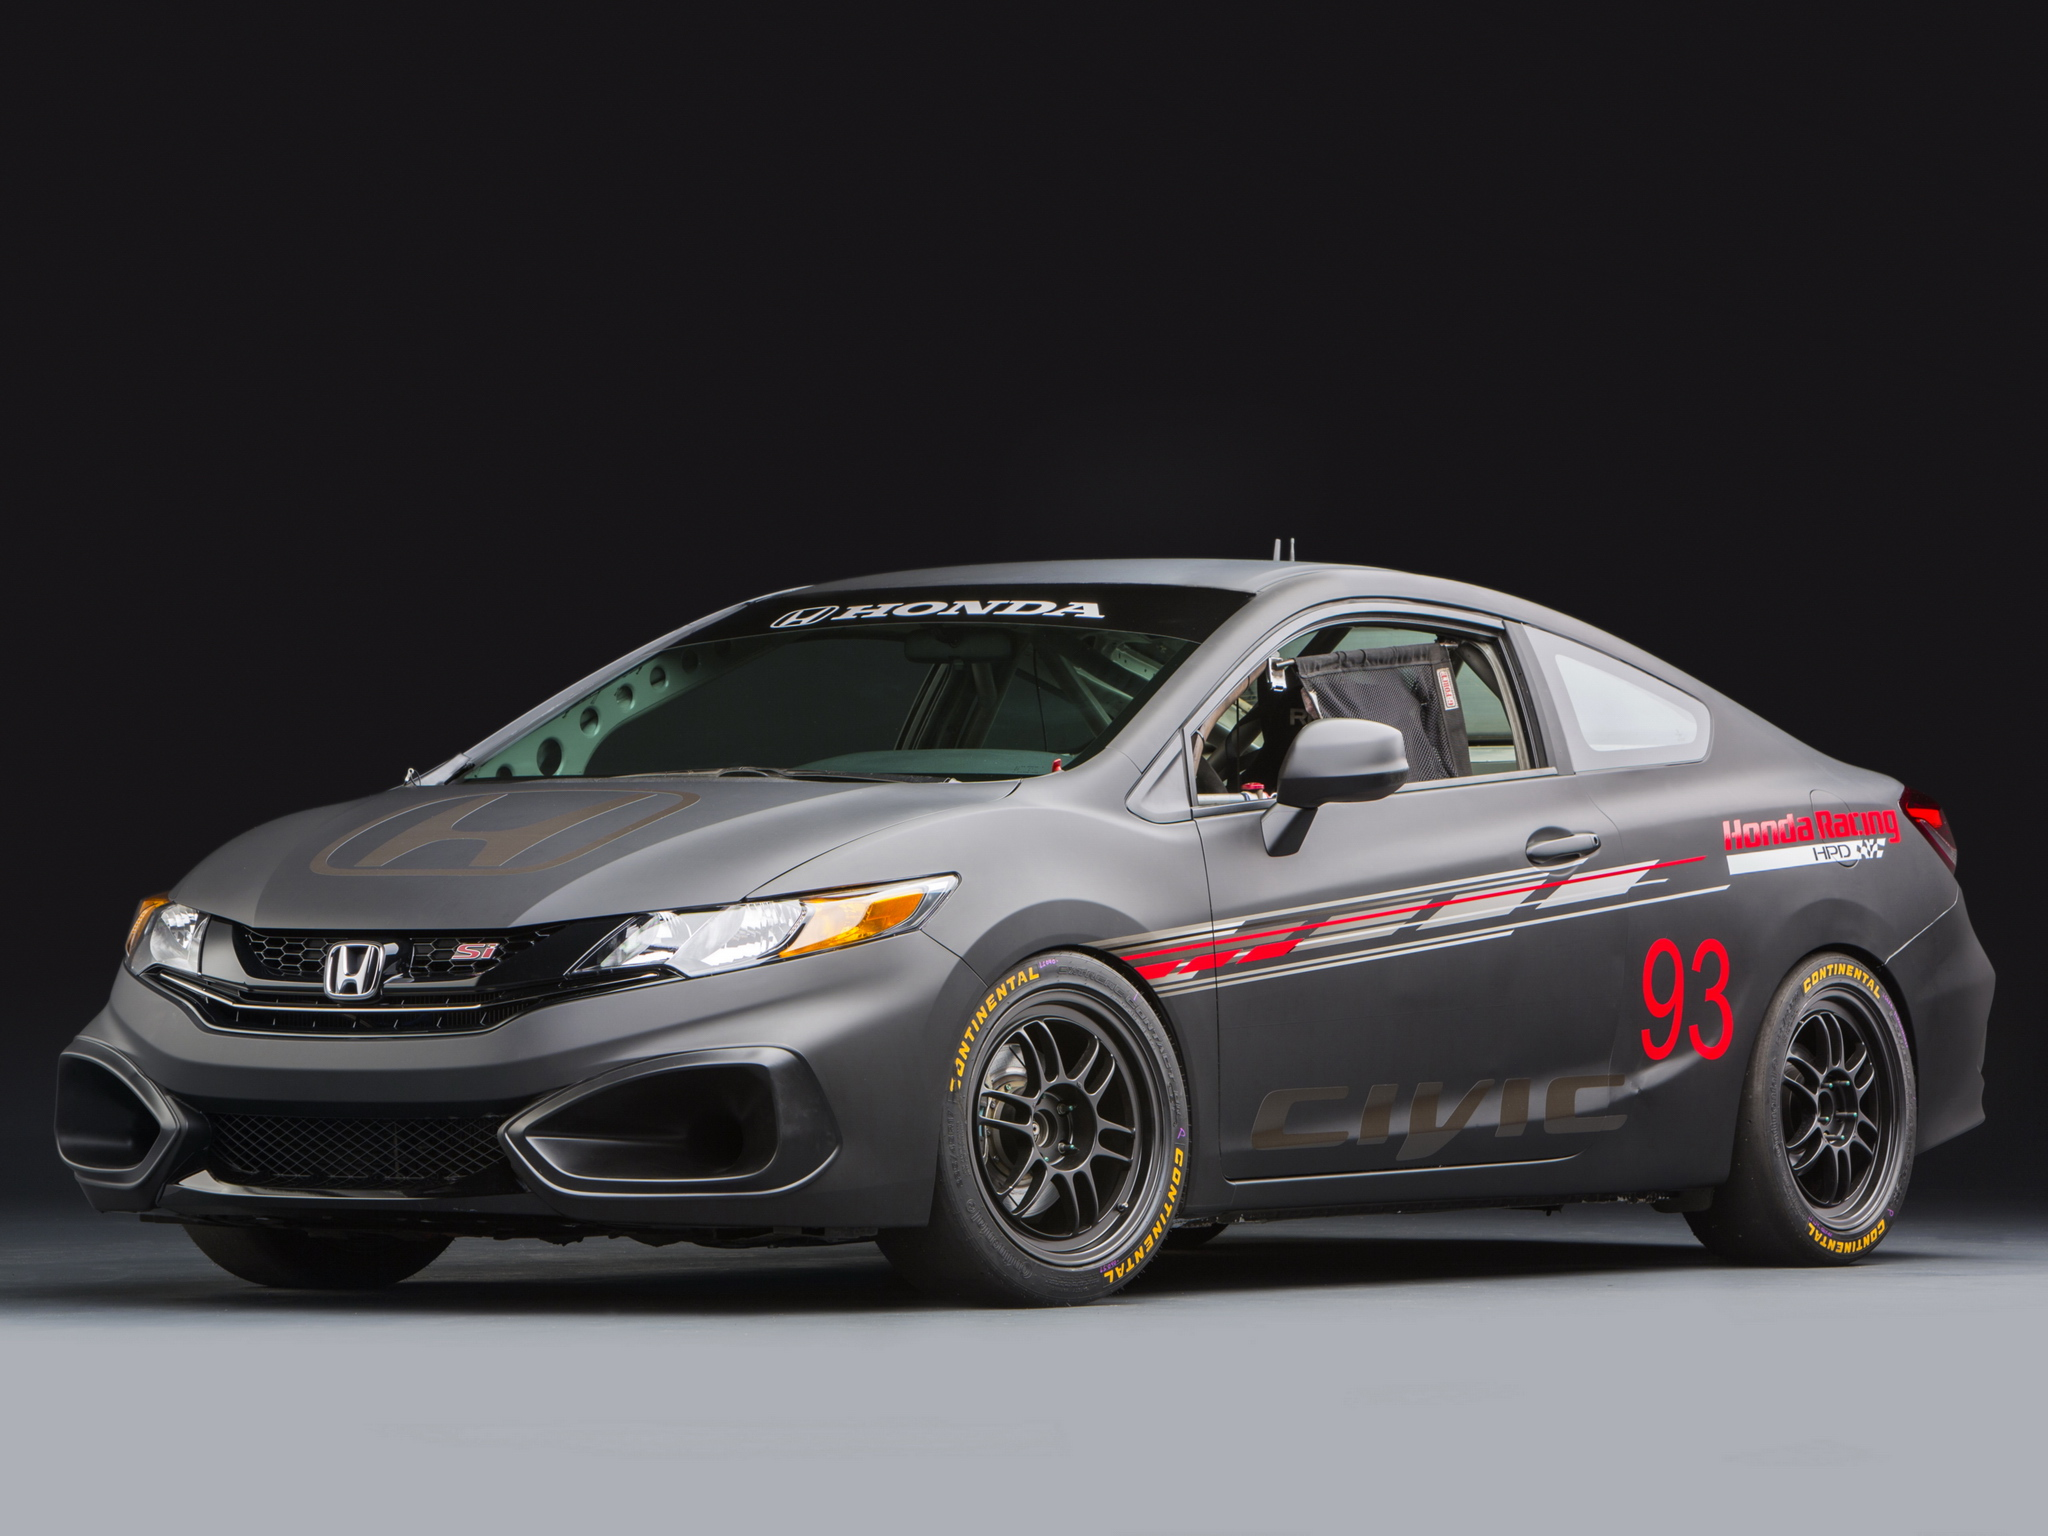 Honda Civic Si 2013 Coupe Black